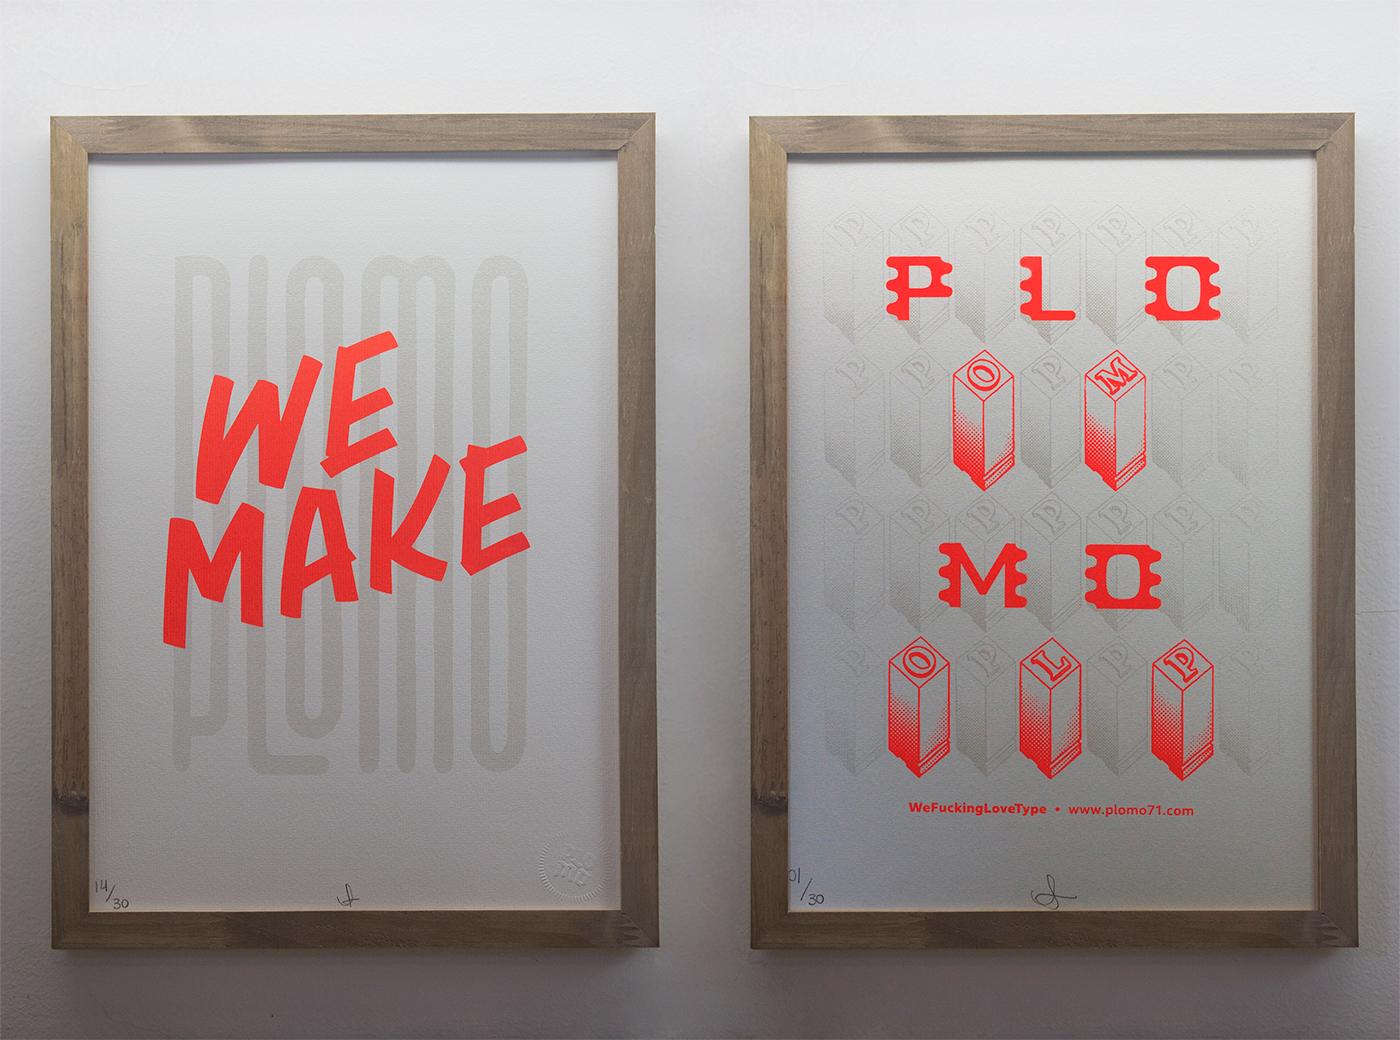 lettering silkscreen artwork type plomo71 poster cartel cartaz